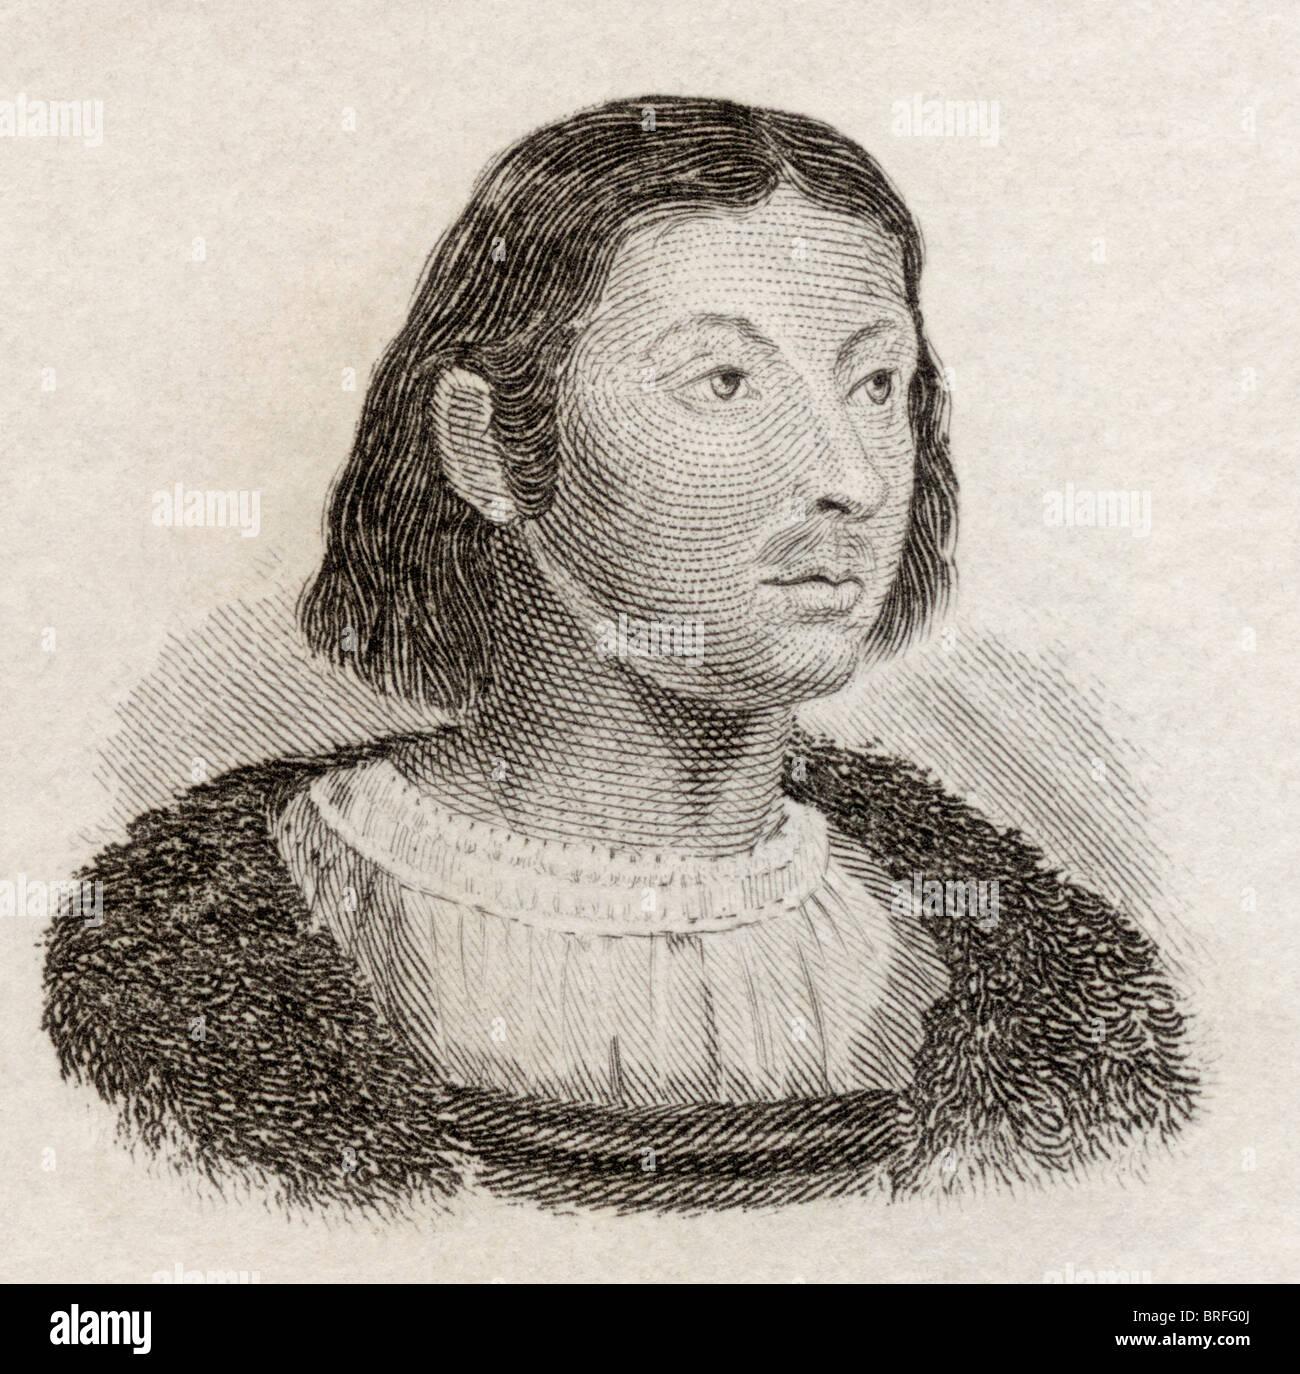 Giovanni Boccaccio, 1313 to 1375. Italian author, poet, Renaissance humanist and author. - Stock Image